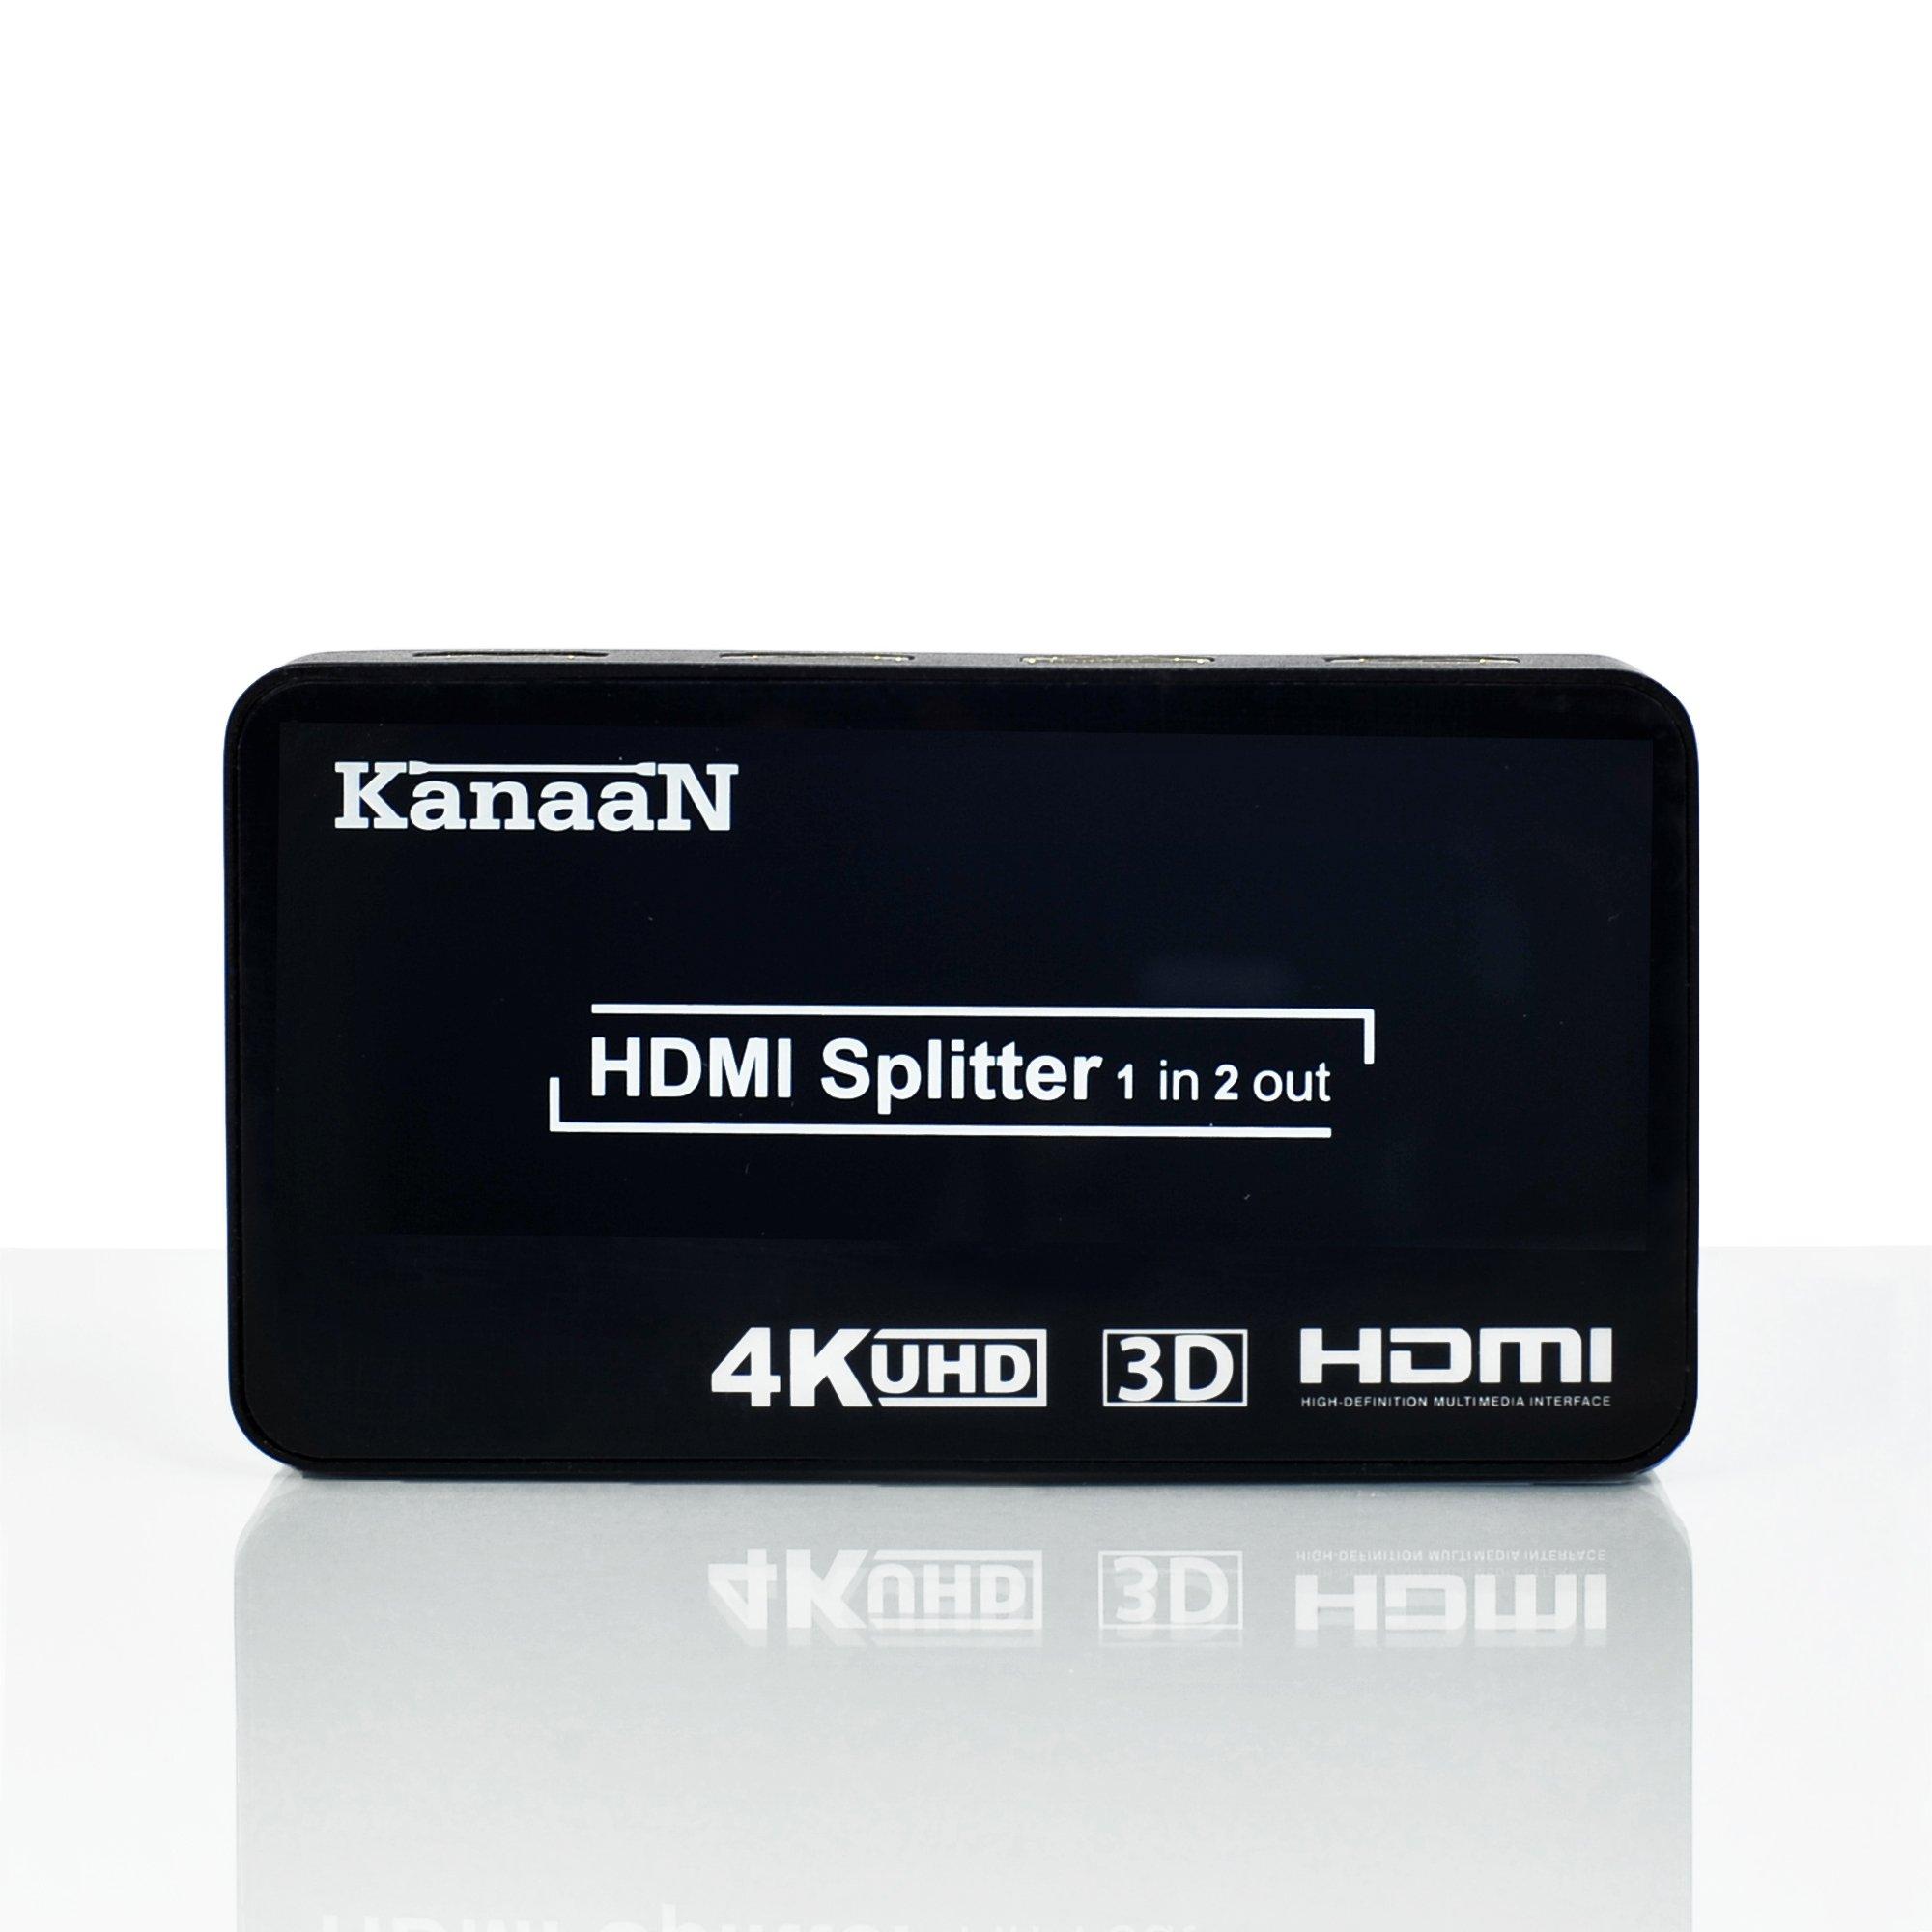 KanaaN HDMI Splitter 4K 1x2 Switch | soporta señales UHD UHD-TV, 3D, 4K, 4K, 4K